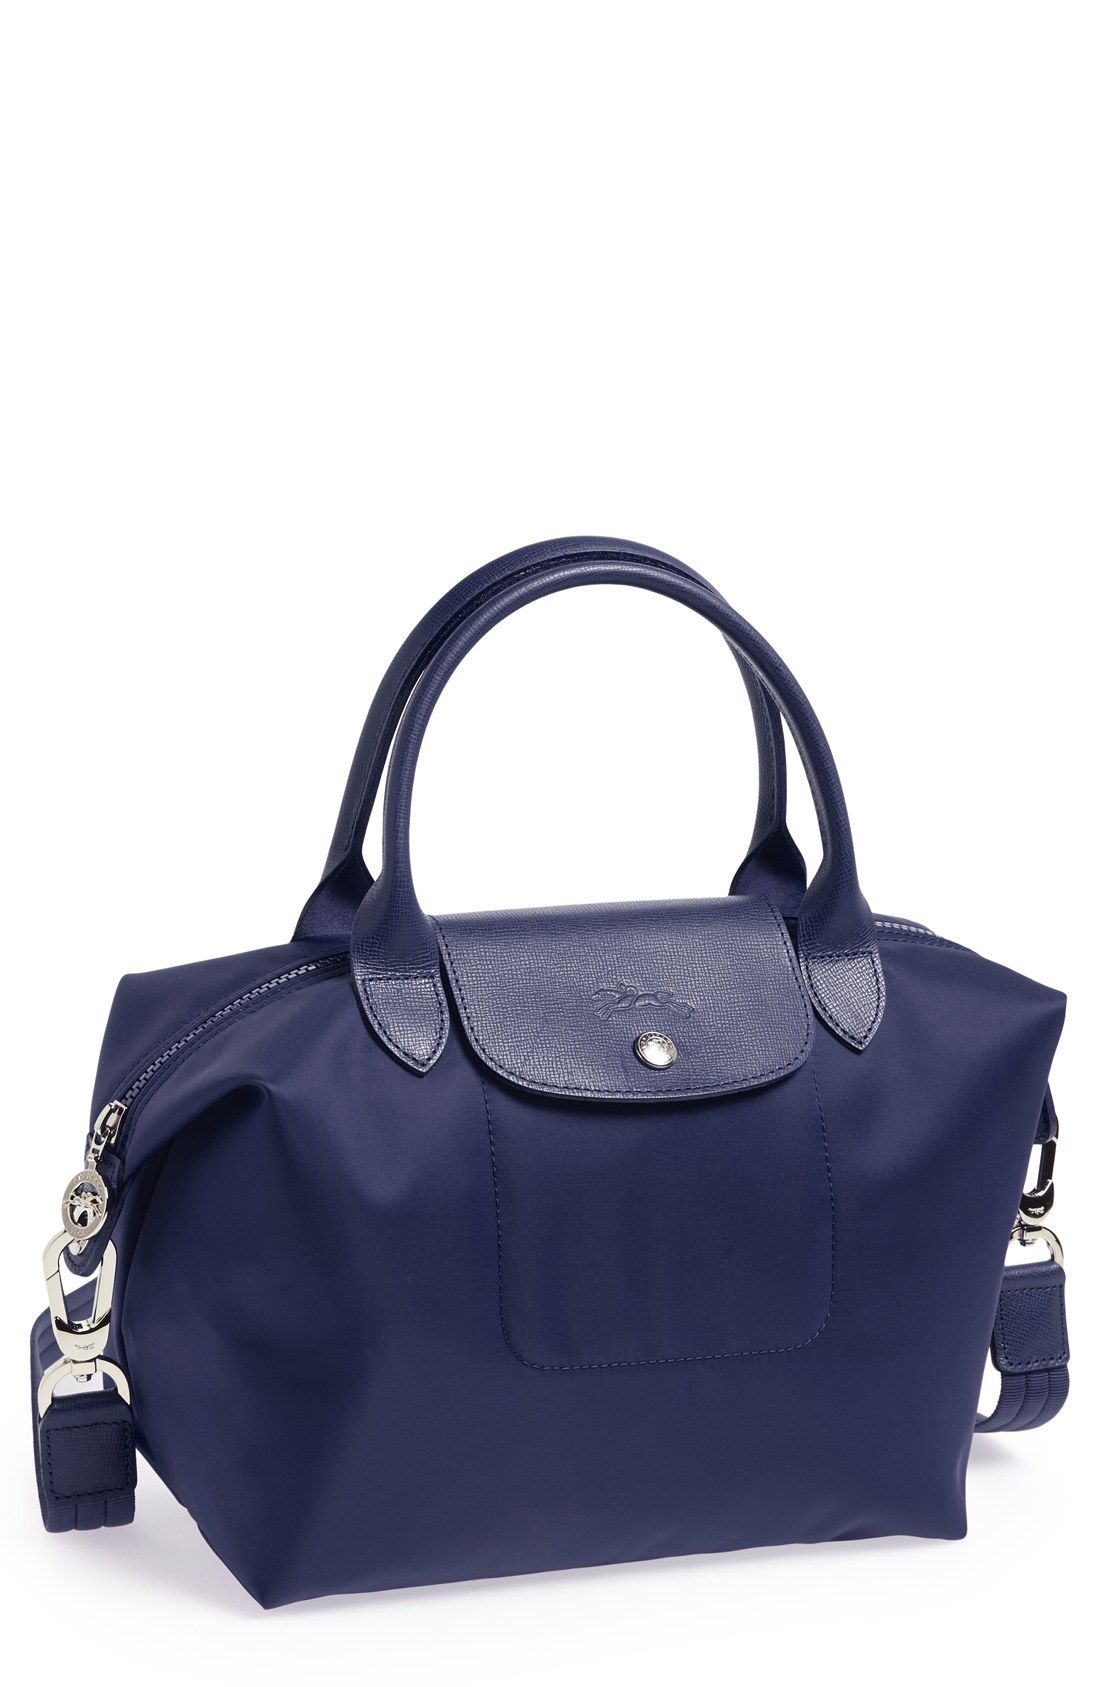 Le Pliage Small Travel Bag